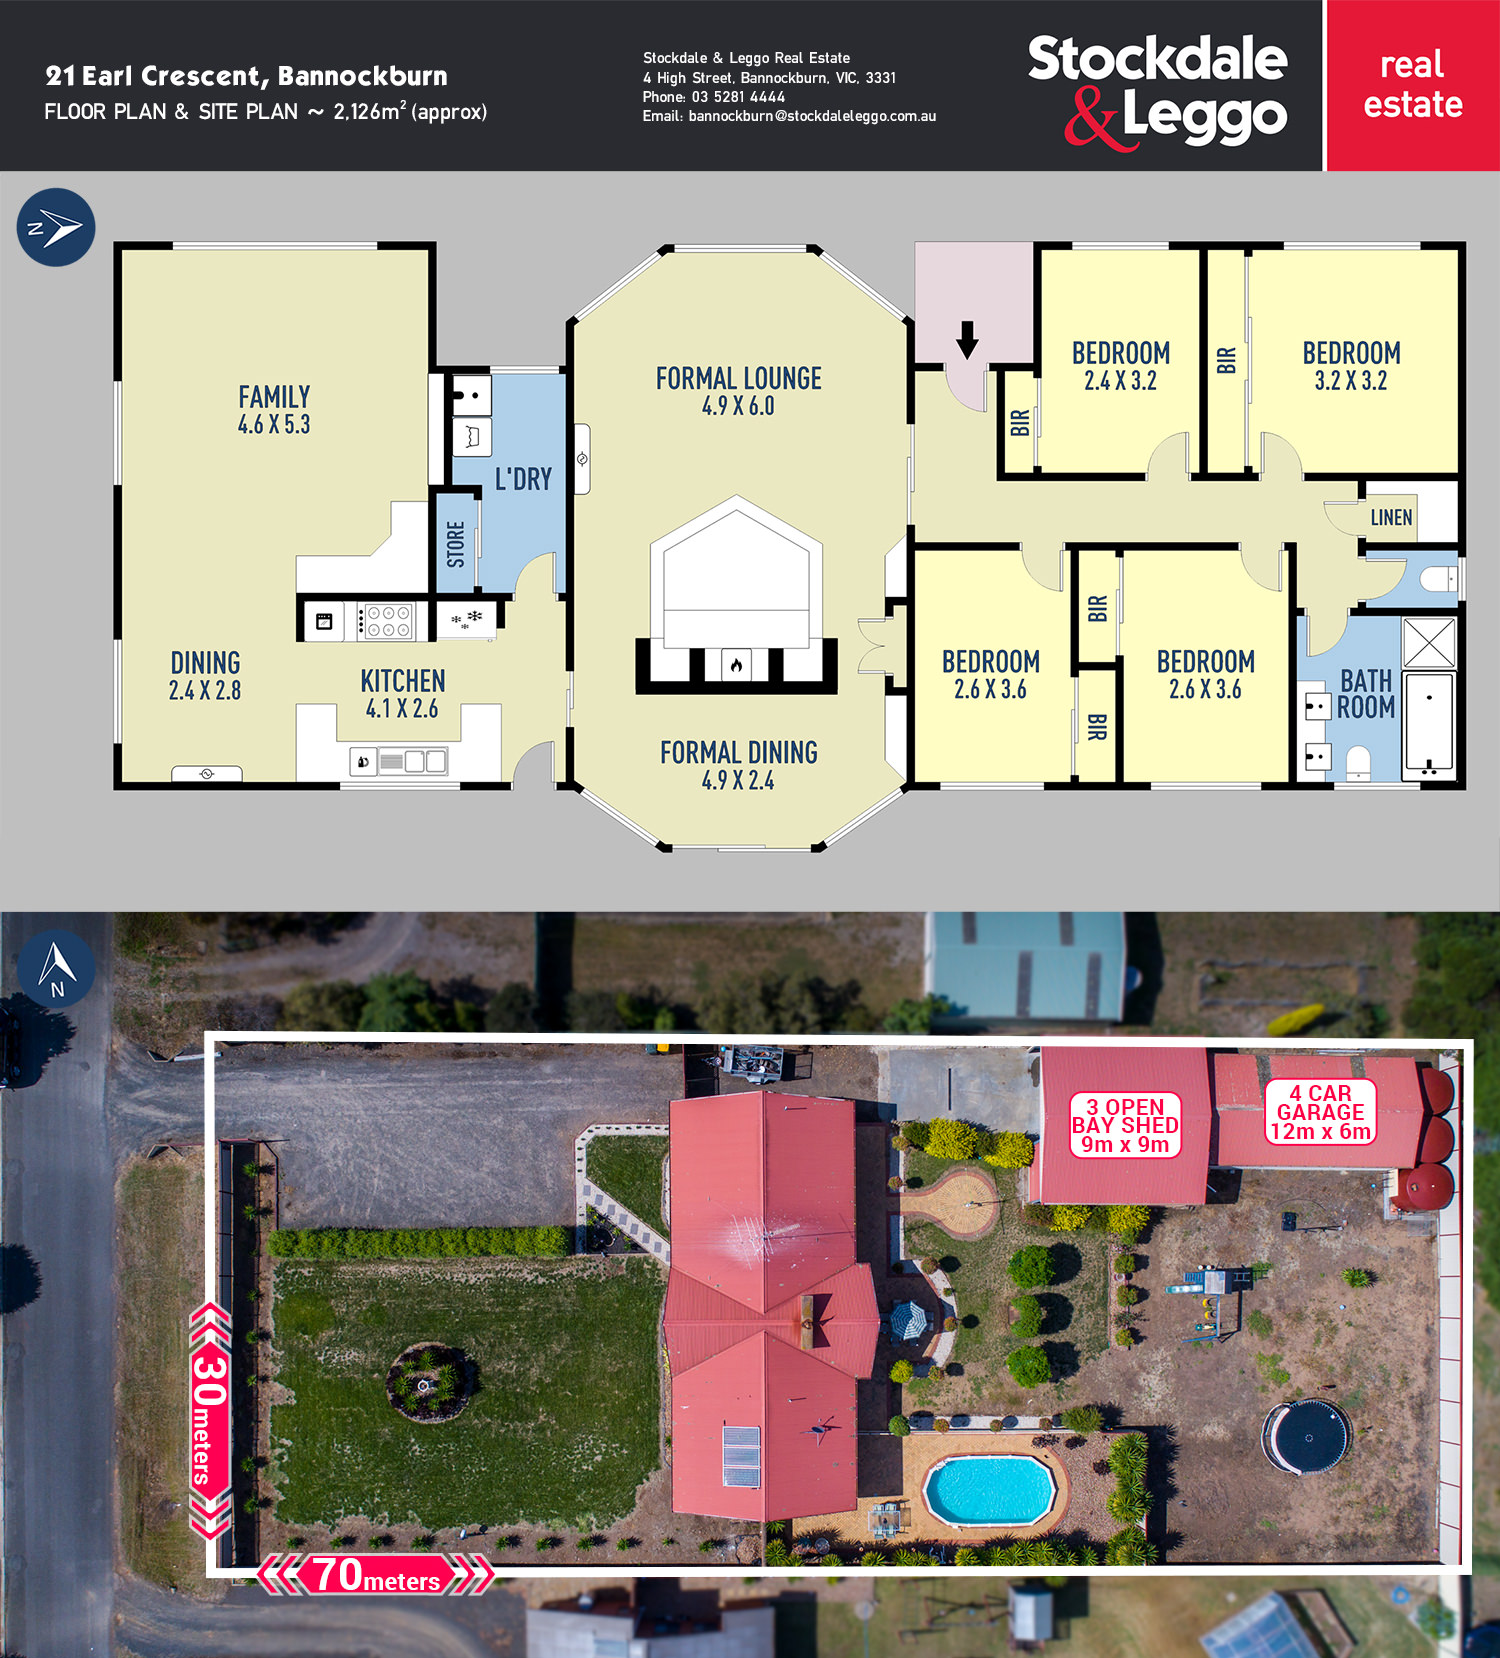 Geelong Site Plan for real estate21-Earl-Crescent-Bannockburn.jpg